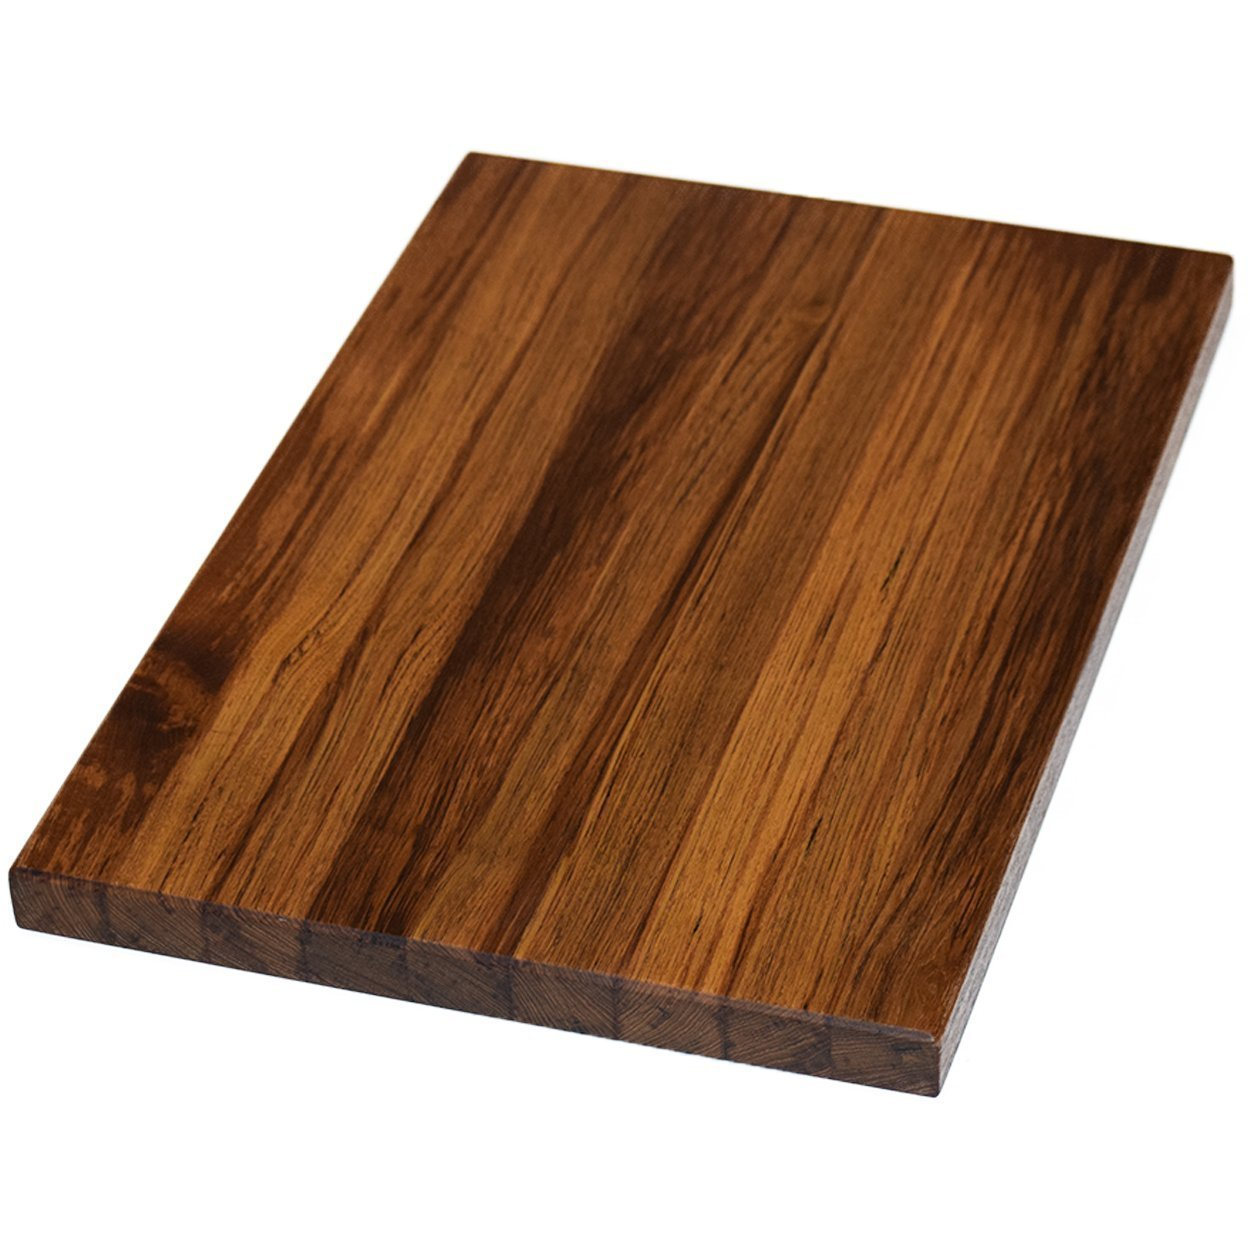 Teak Wood Edge Grain Cutting Board Handmade Reversible Butcher Block by The Practical Plankist (Image #1)